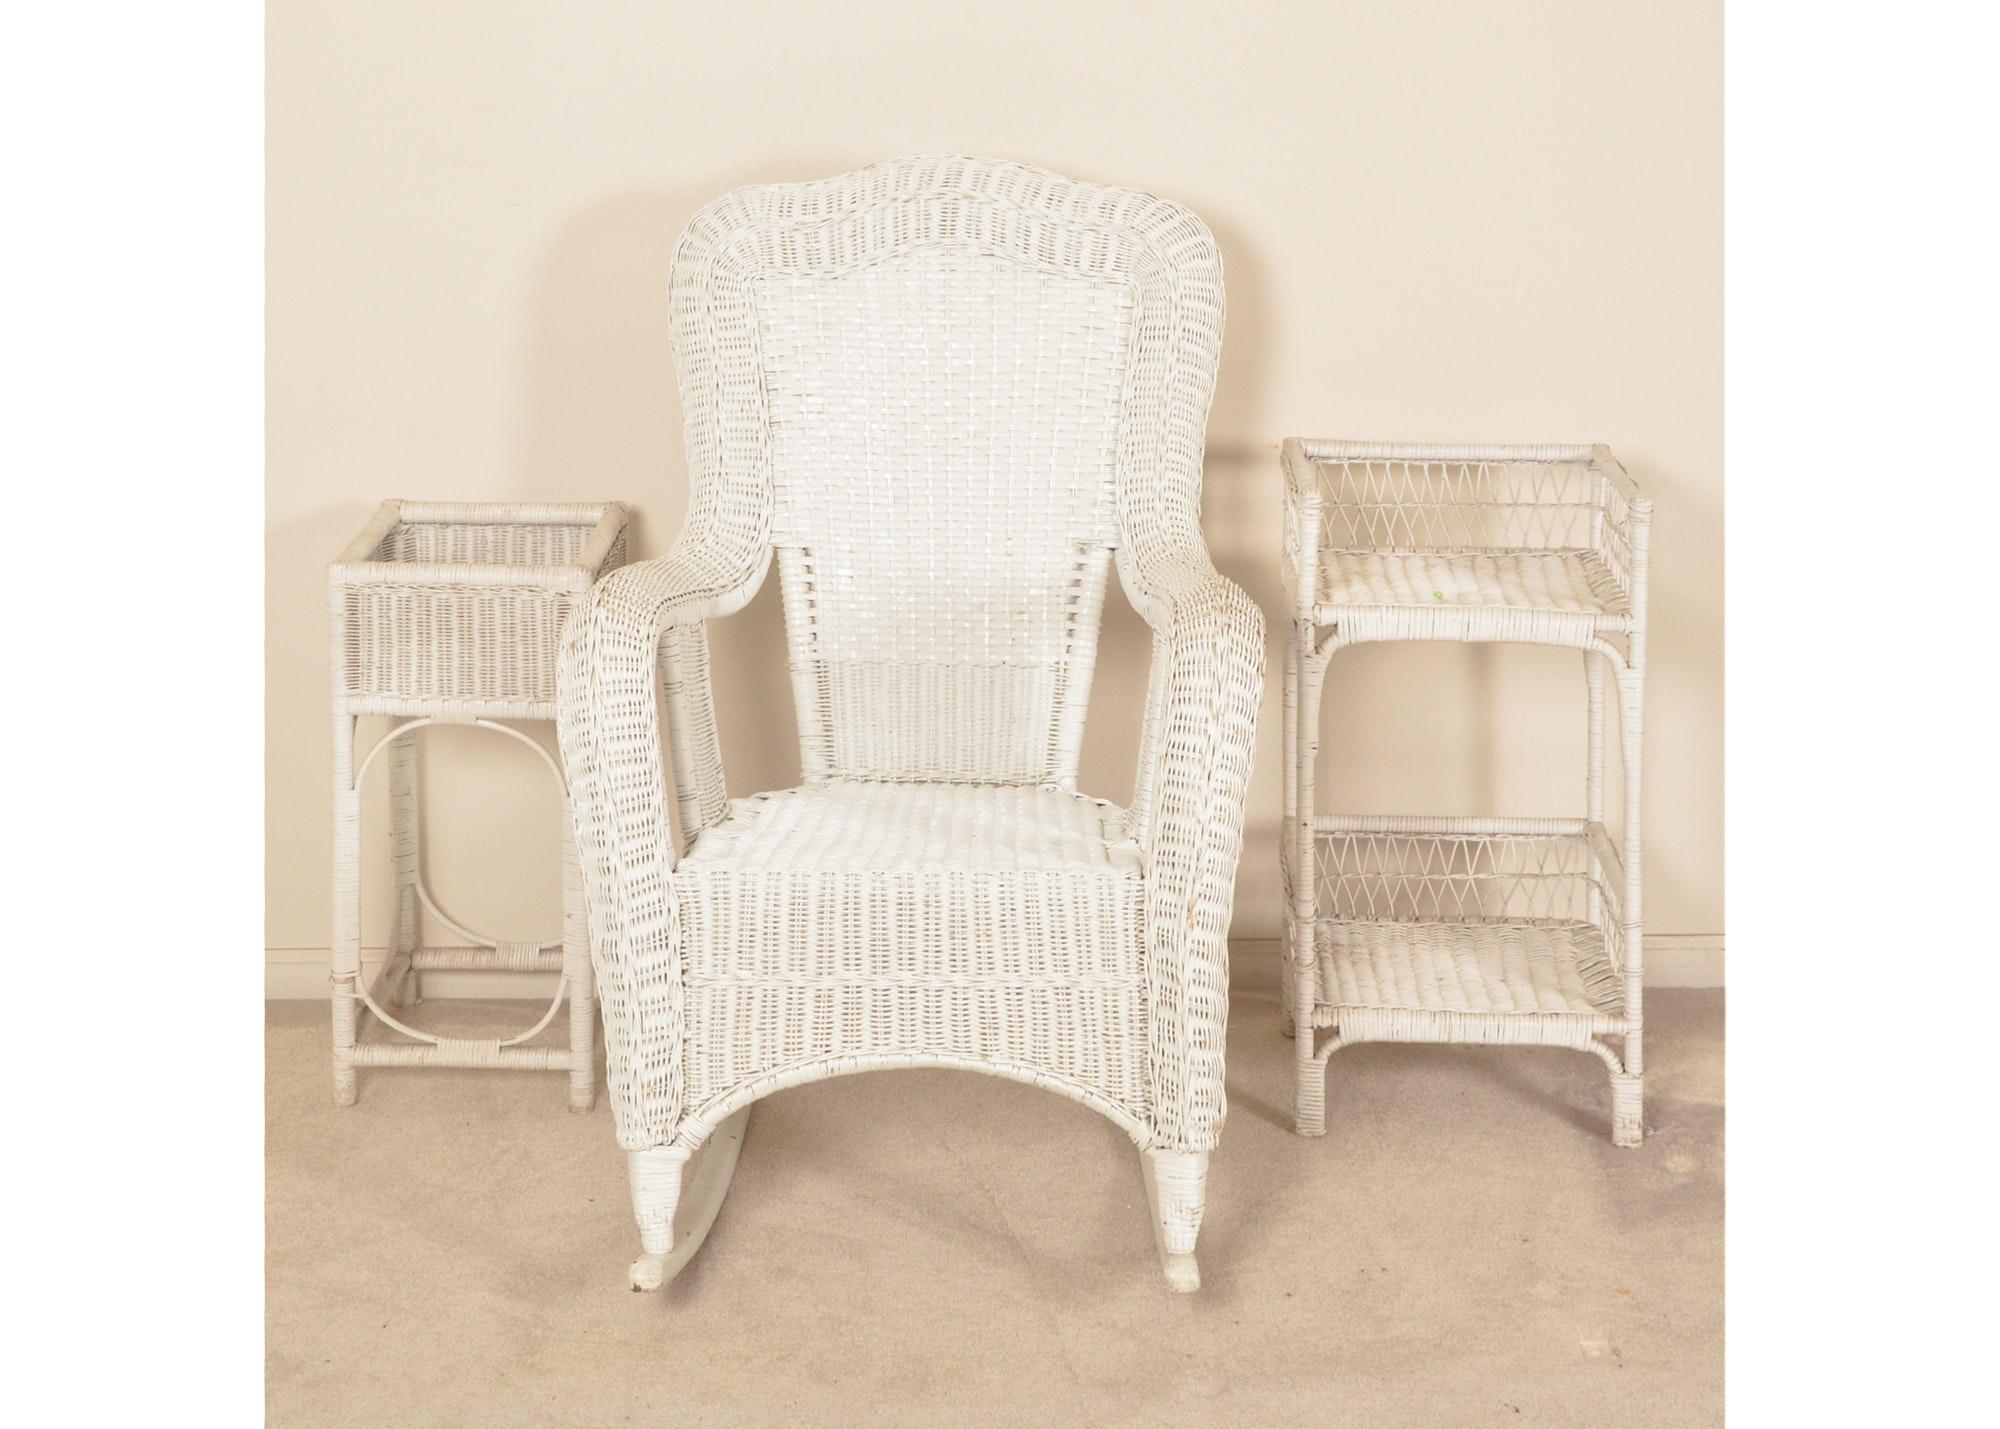 Wicker Rocking Chair, Shelf and Planter